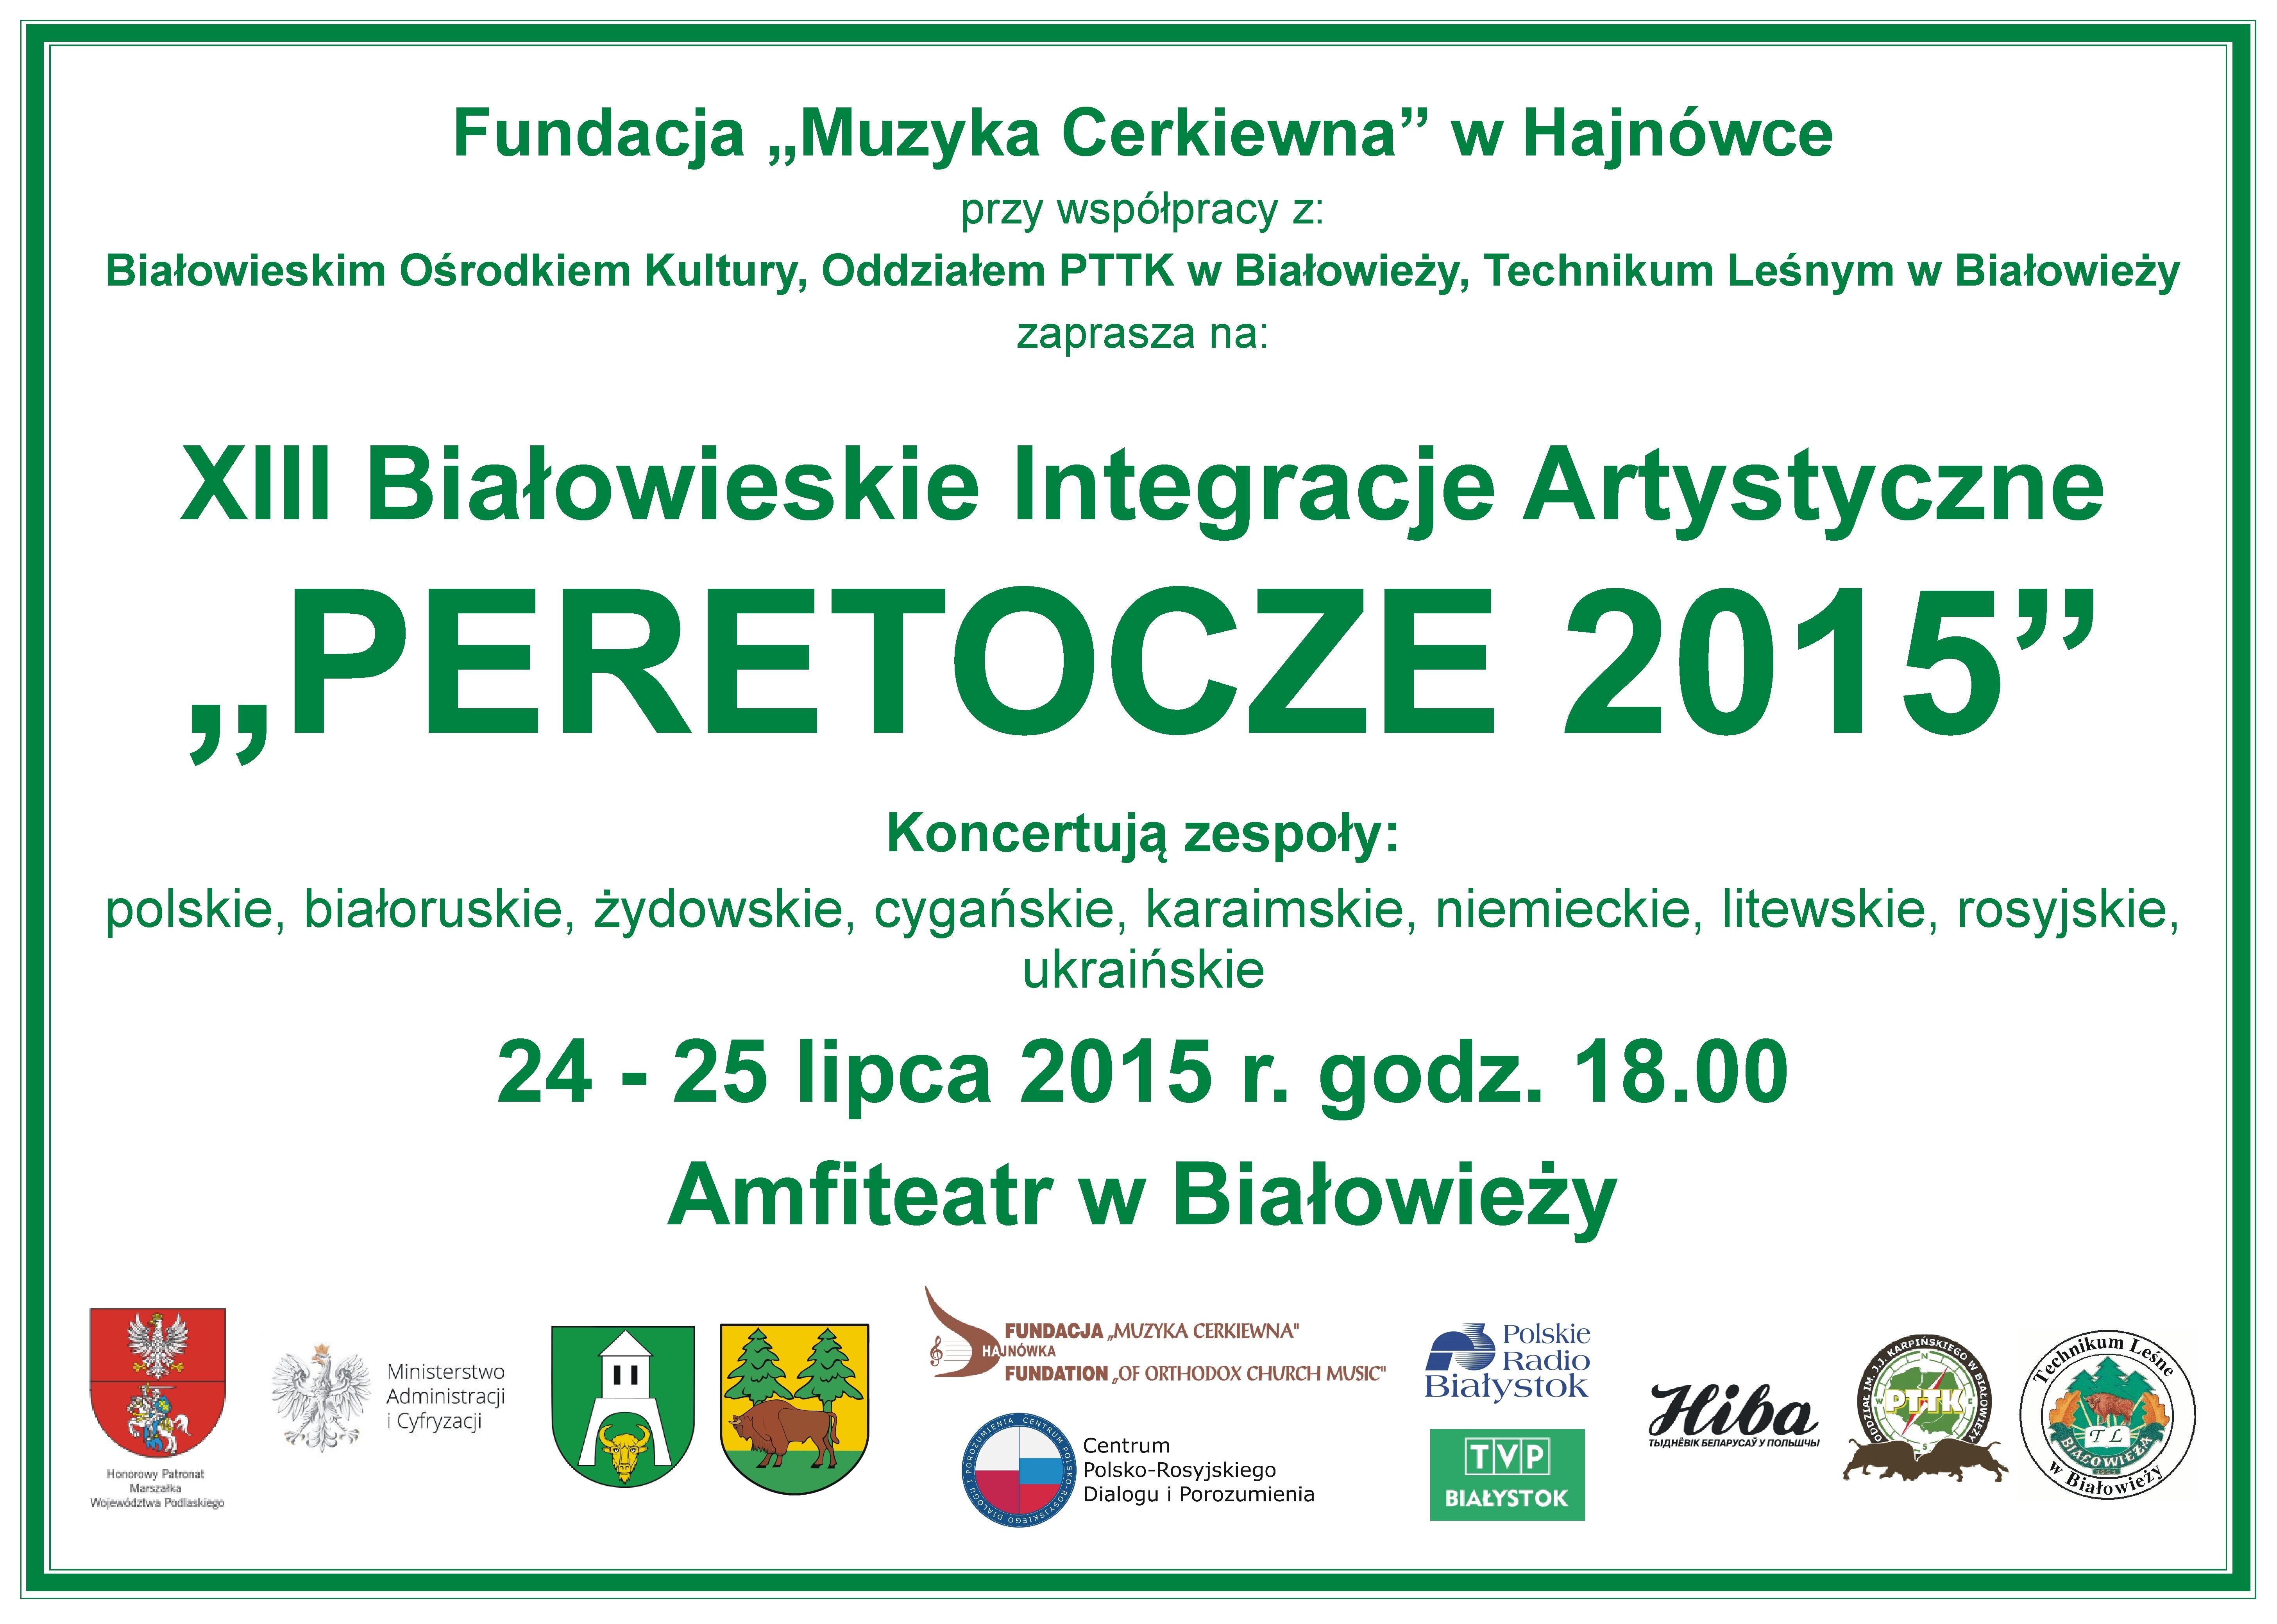 Peretocze 2015